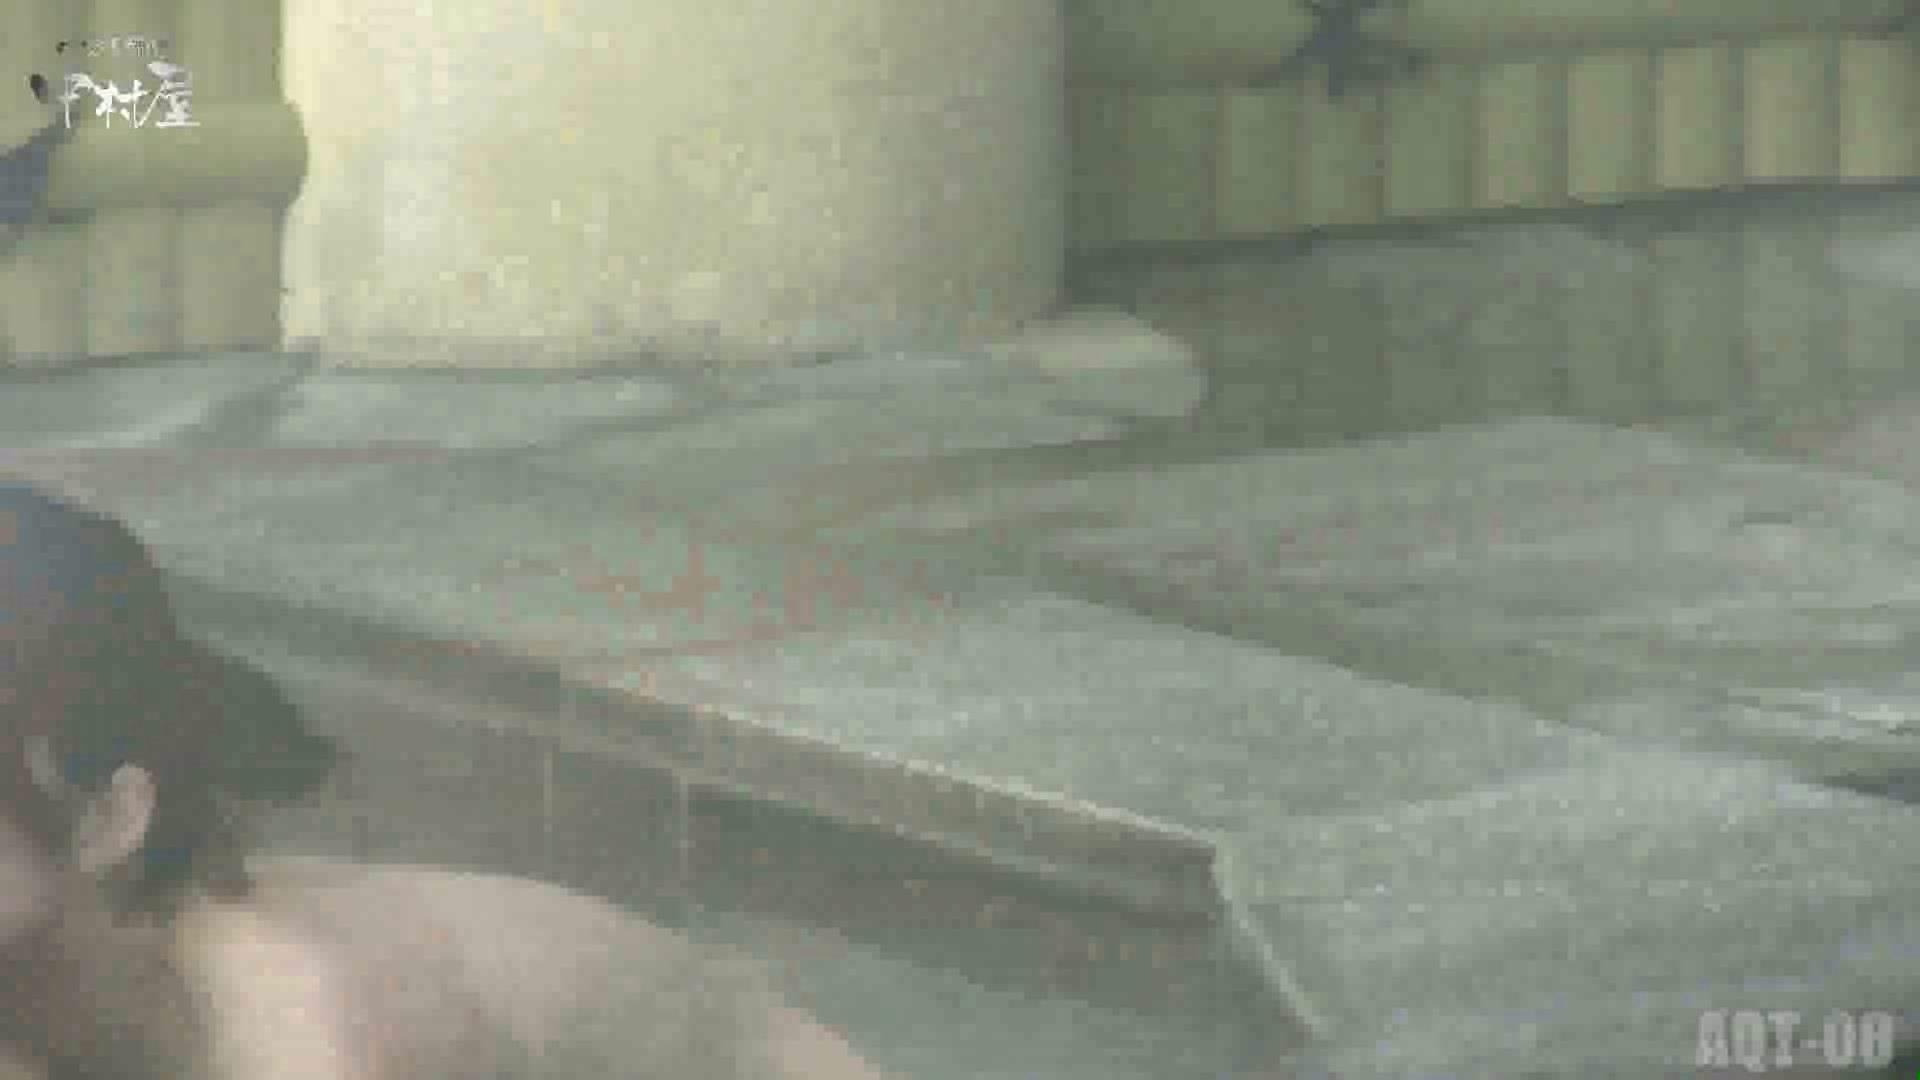 Aquaな露天風呂Vol.872潜入盗撮露天風呂八判湯 其の三 盗撮特集 | 潜入画像  96画像 32